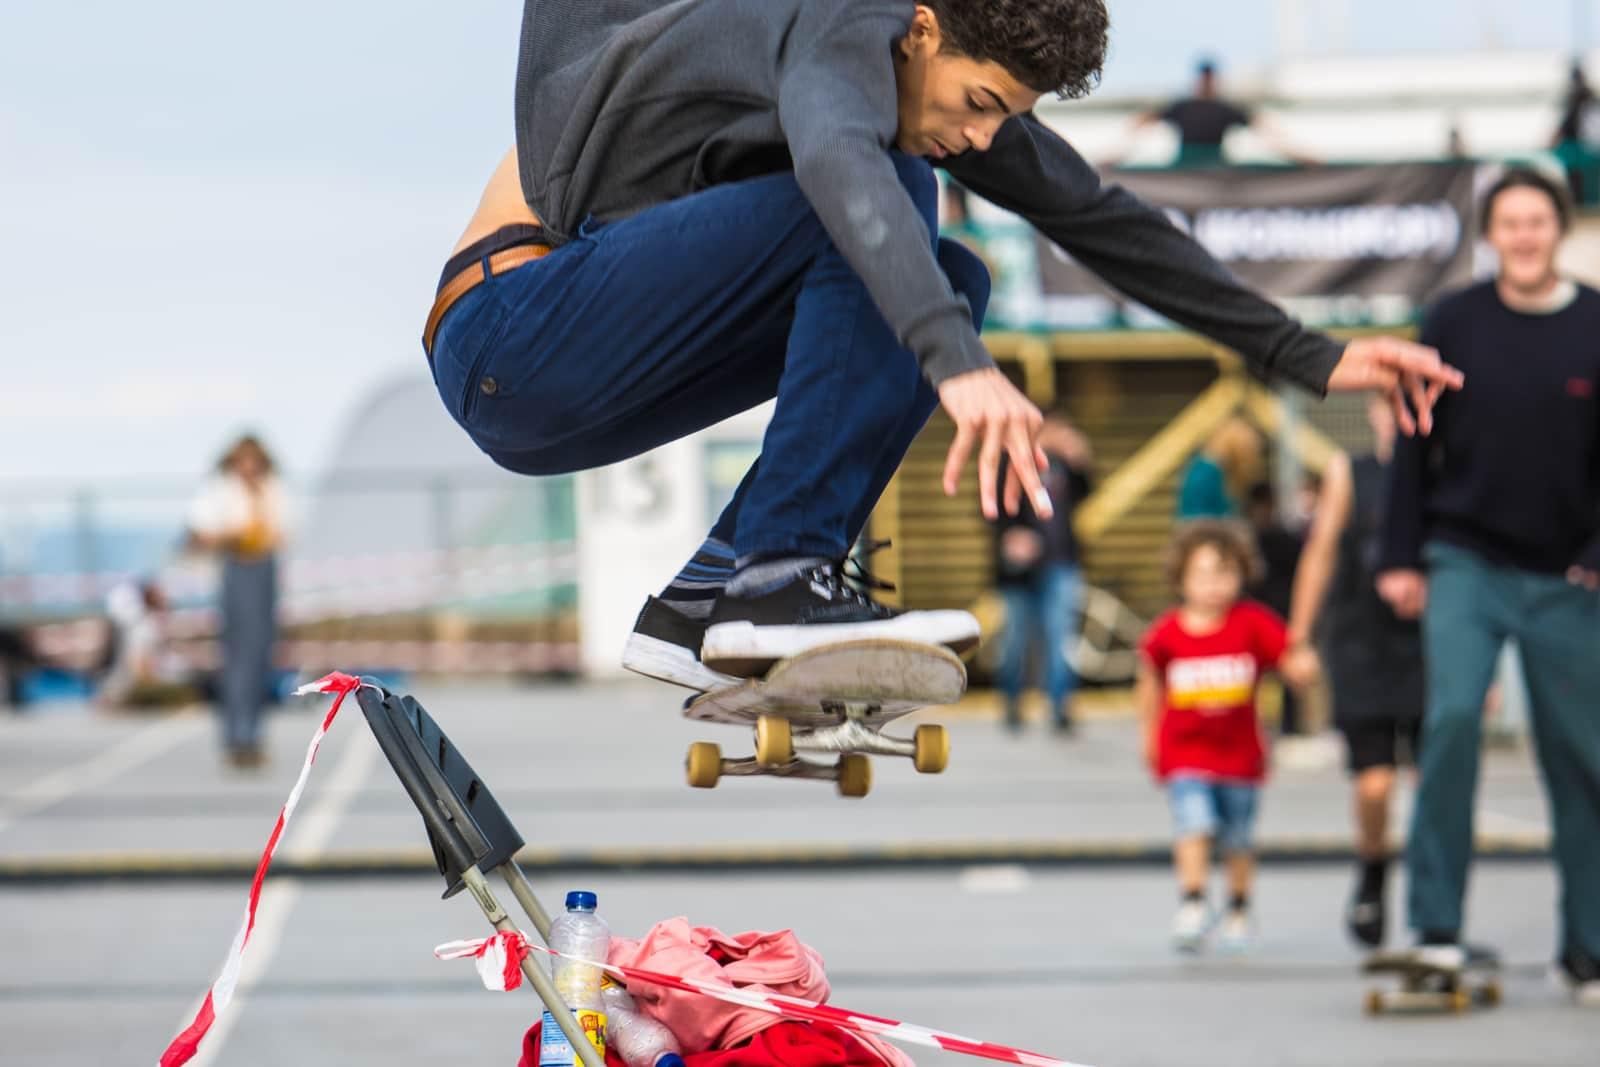 Skater grabbing some air